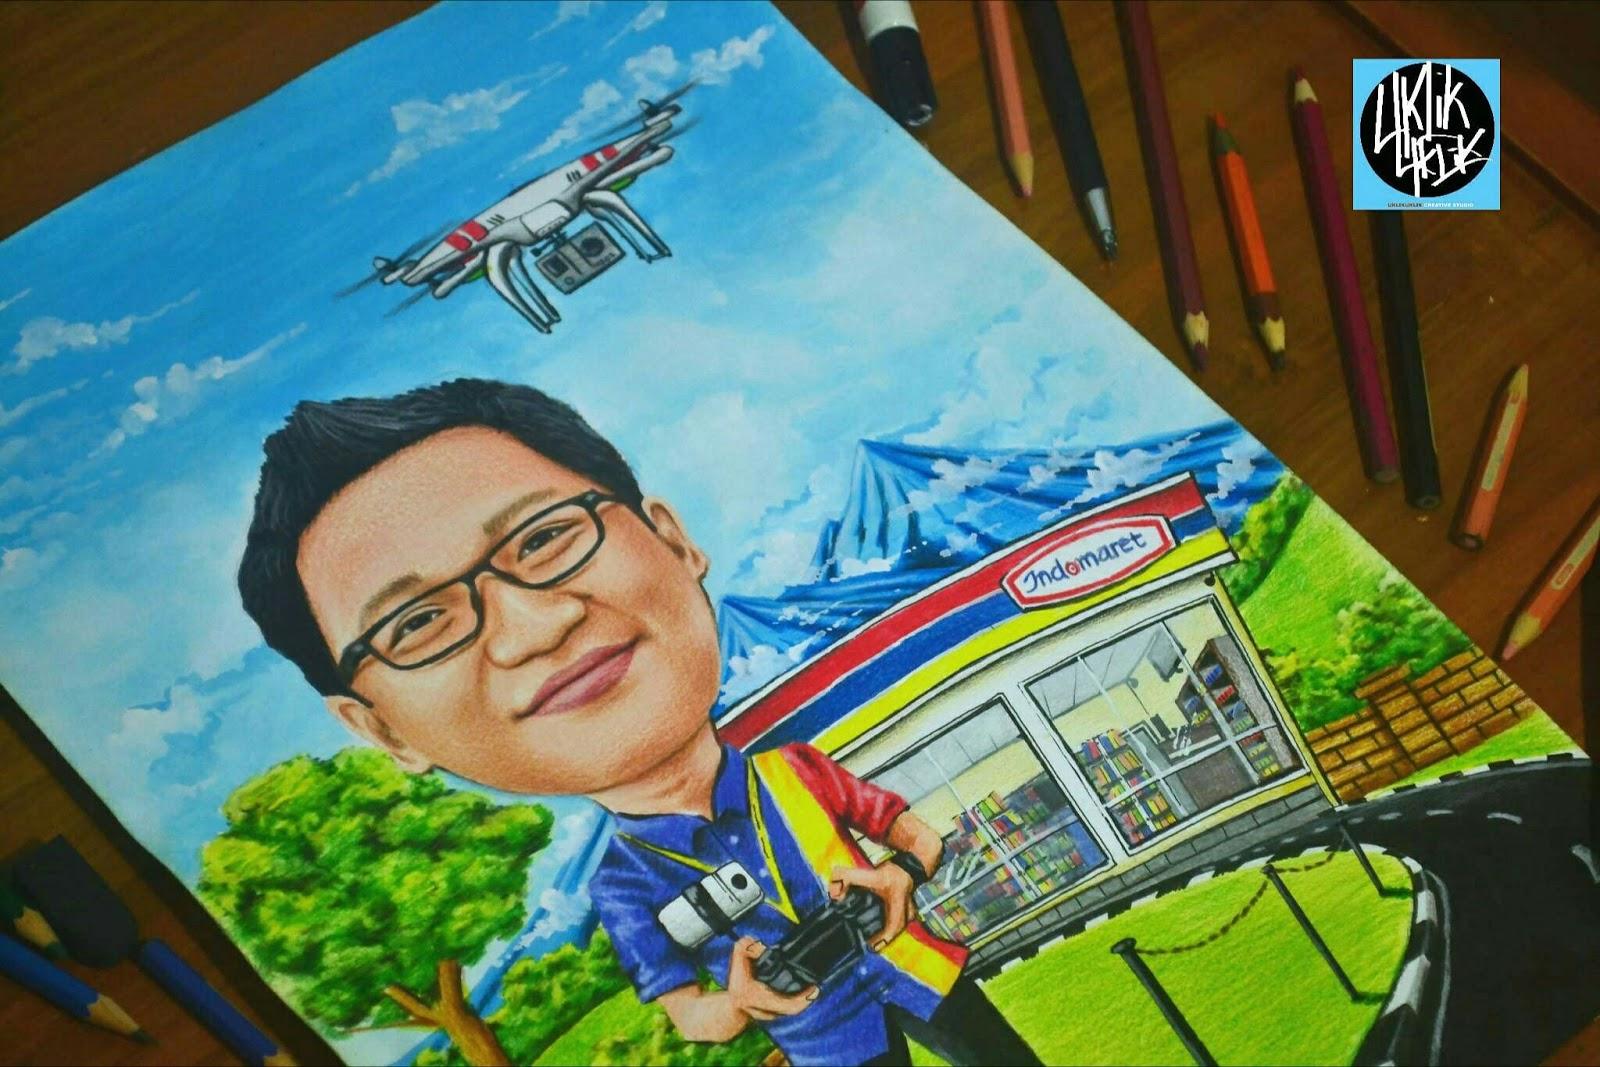 Jasa Karikatur Unik Surabaya Jasa Karikatur Unik Jawa Timur Jasa